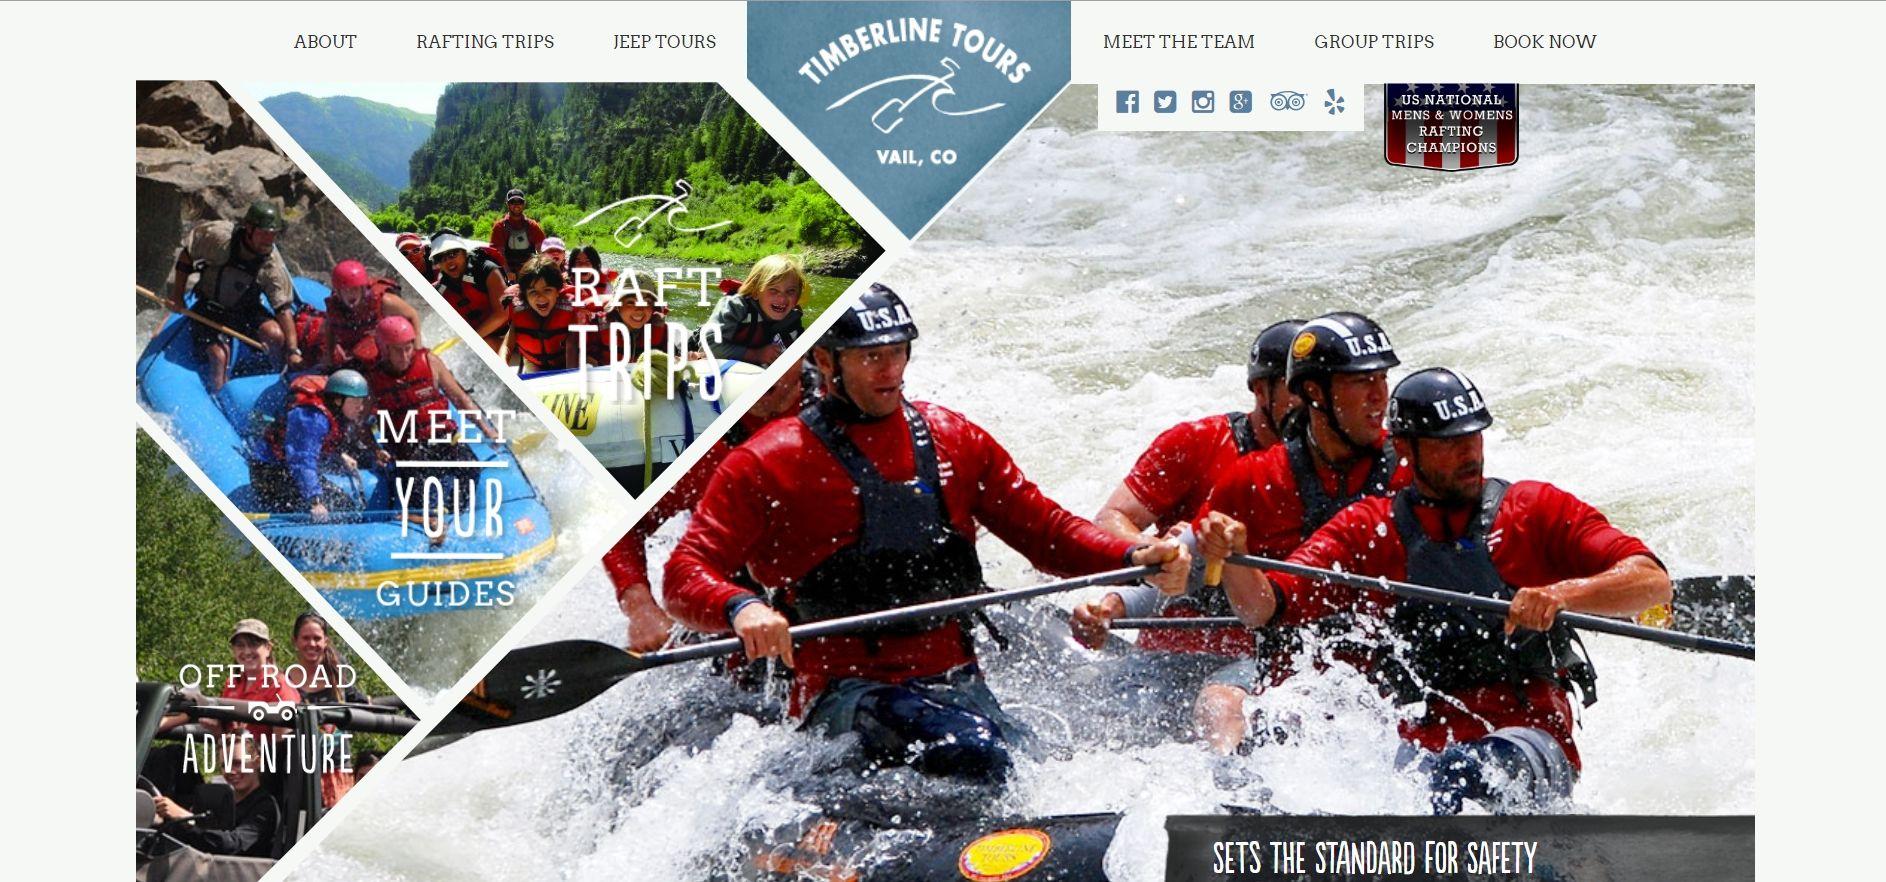 Ukázka asymetrického layoutu na webu timberlinetours.com